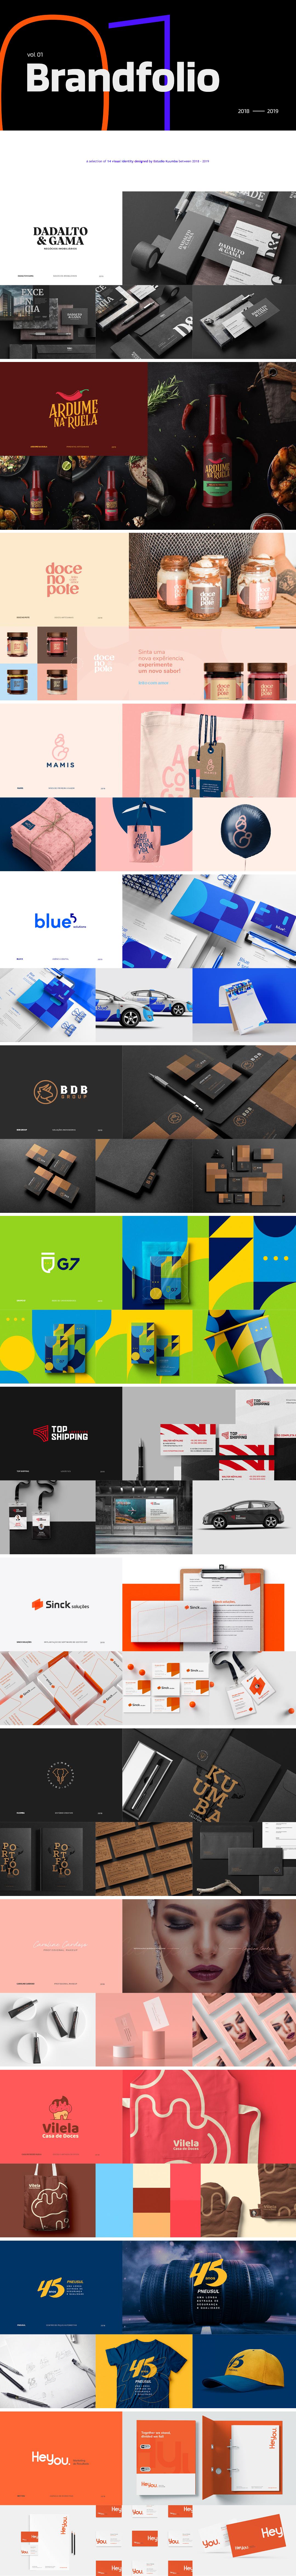 Branding,Graphic Design